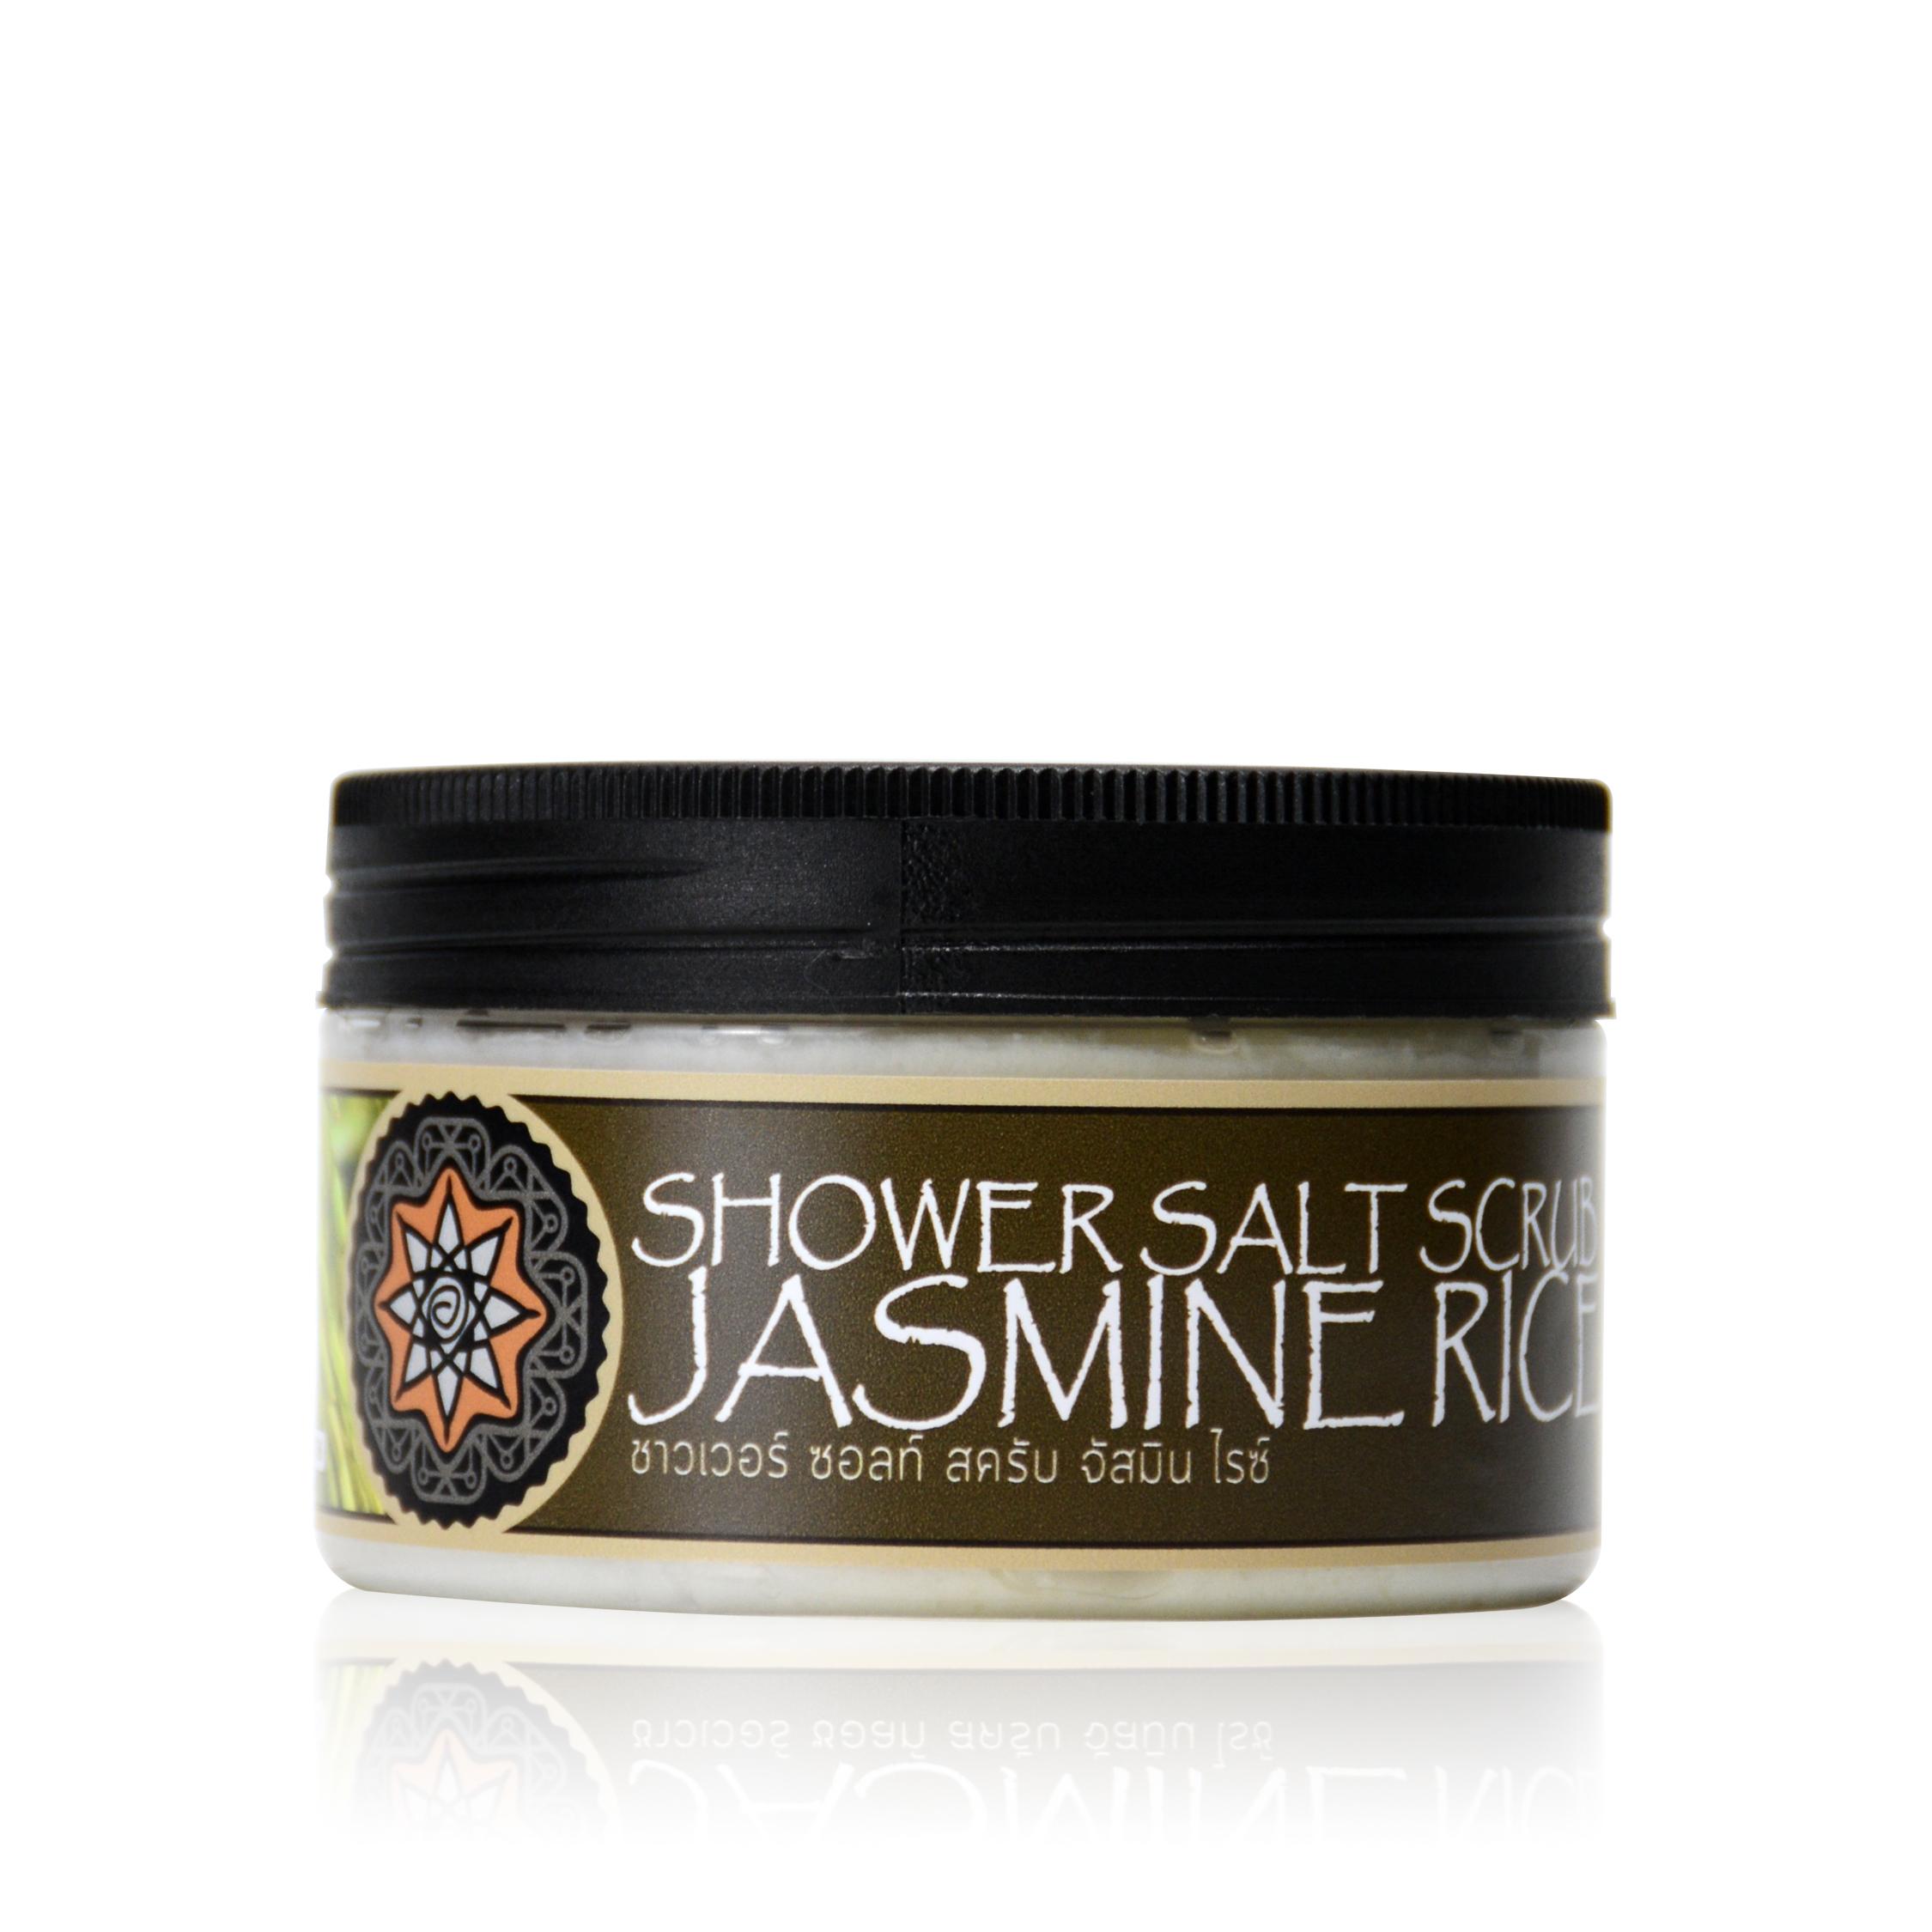 Muối tắm hương Hoa Nhài Body Salt Scrub Jasmine (350gram)